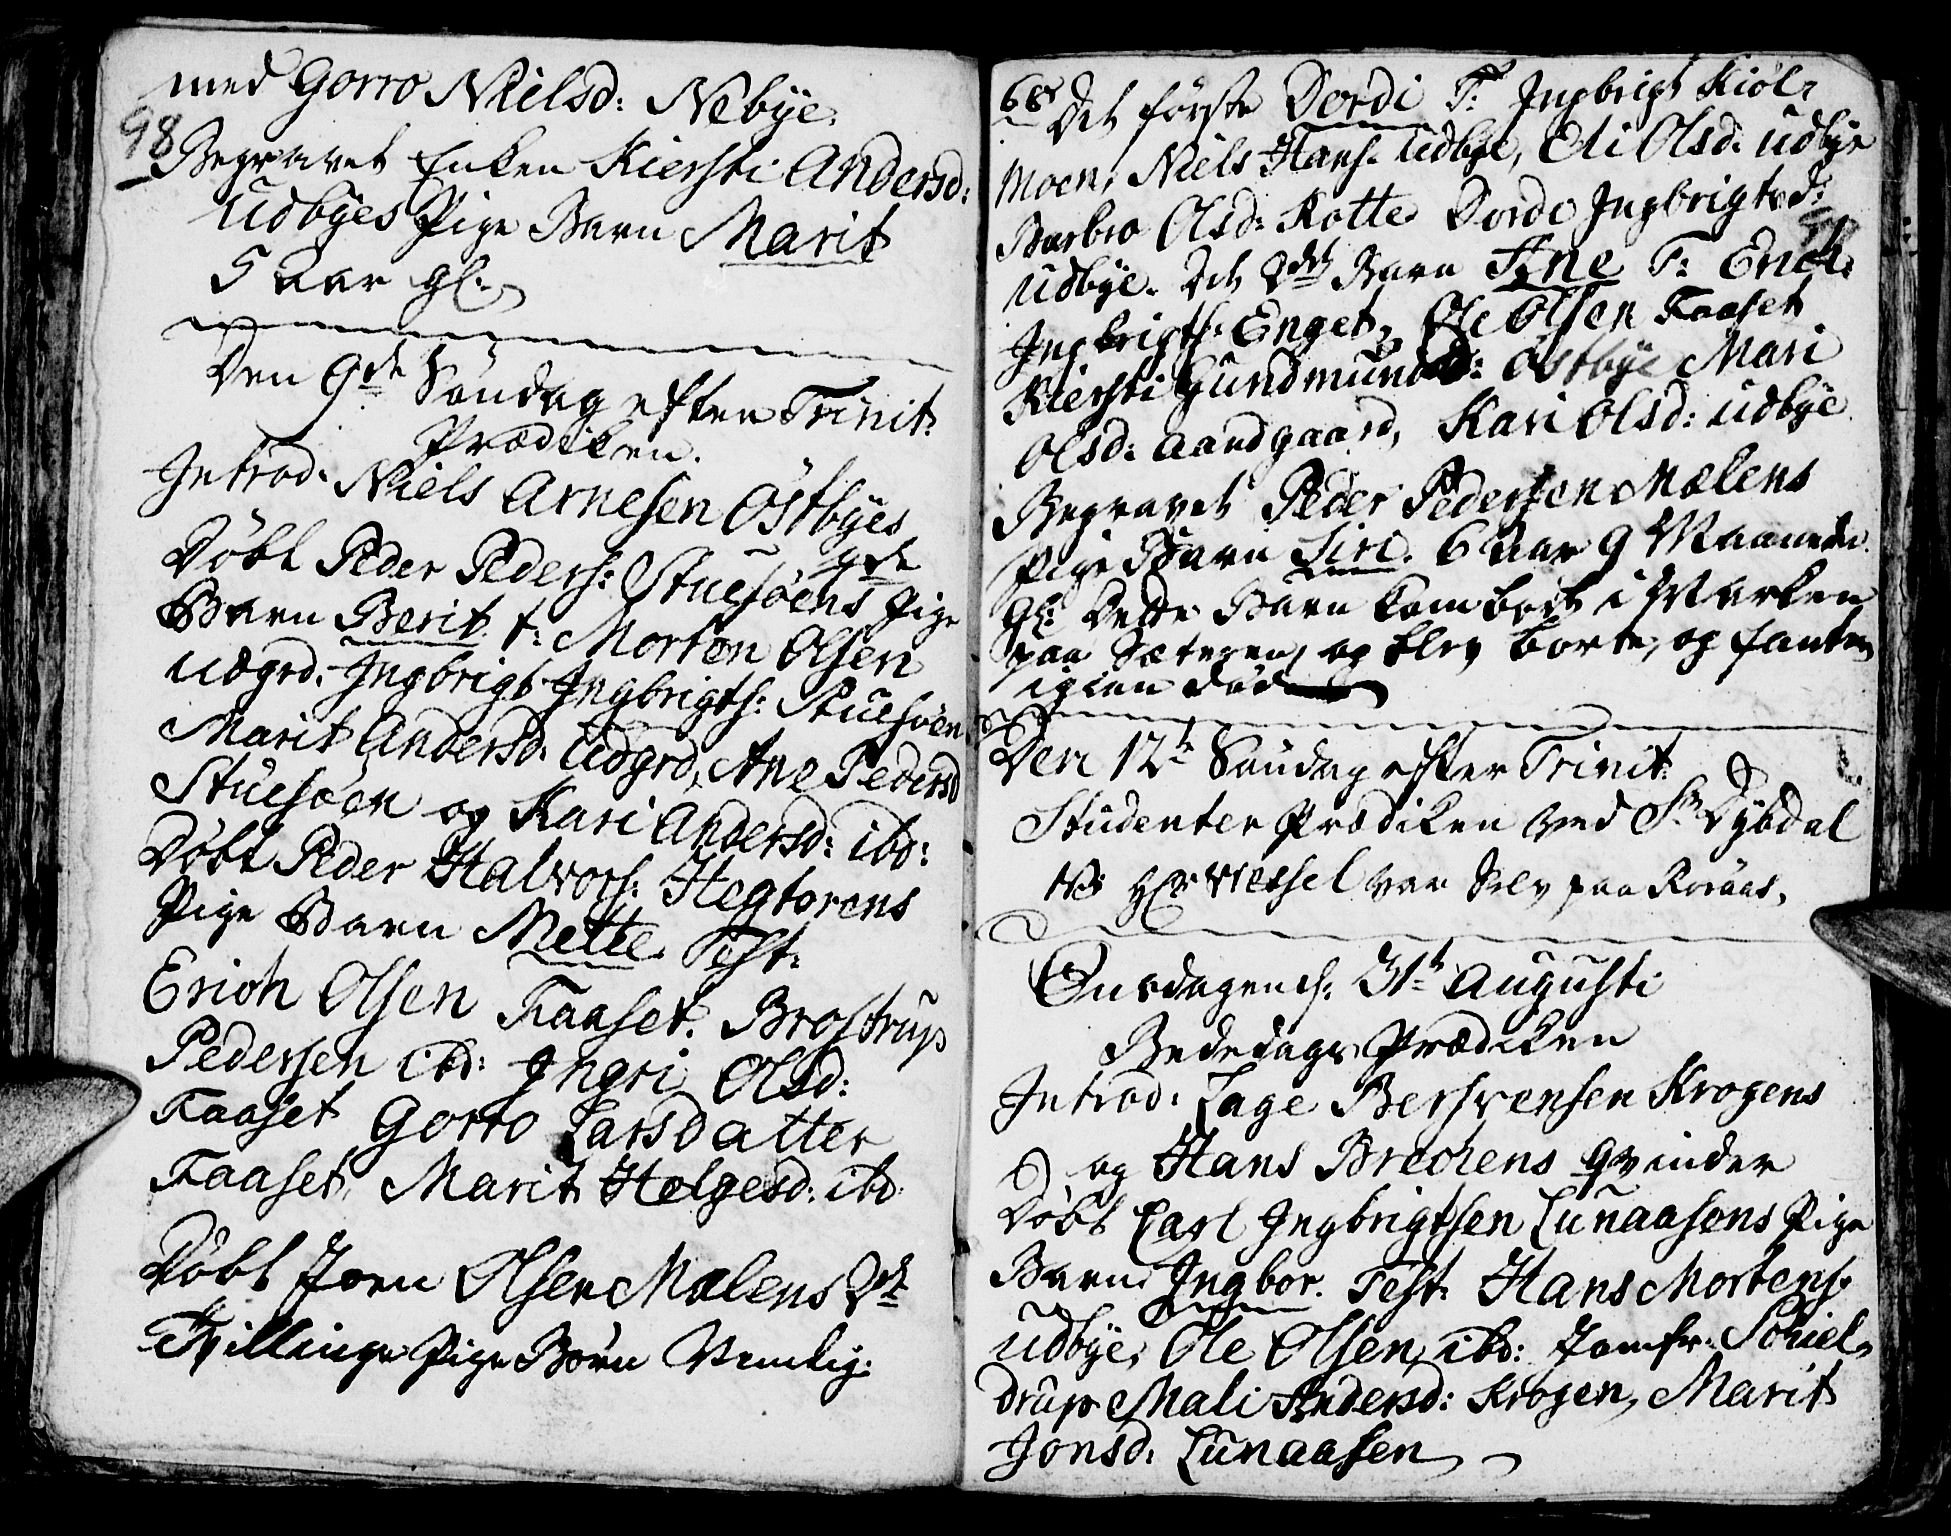 SAH, Tynset prestekontor, Ministerialbok nr. 6, 1763-1779, s. 98-99